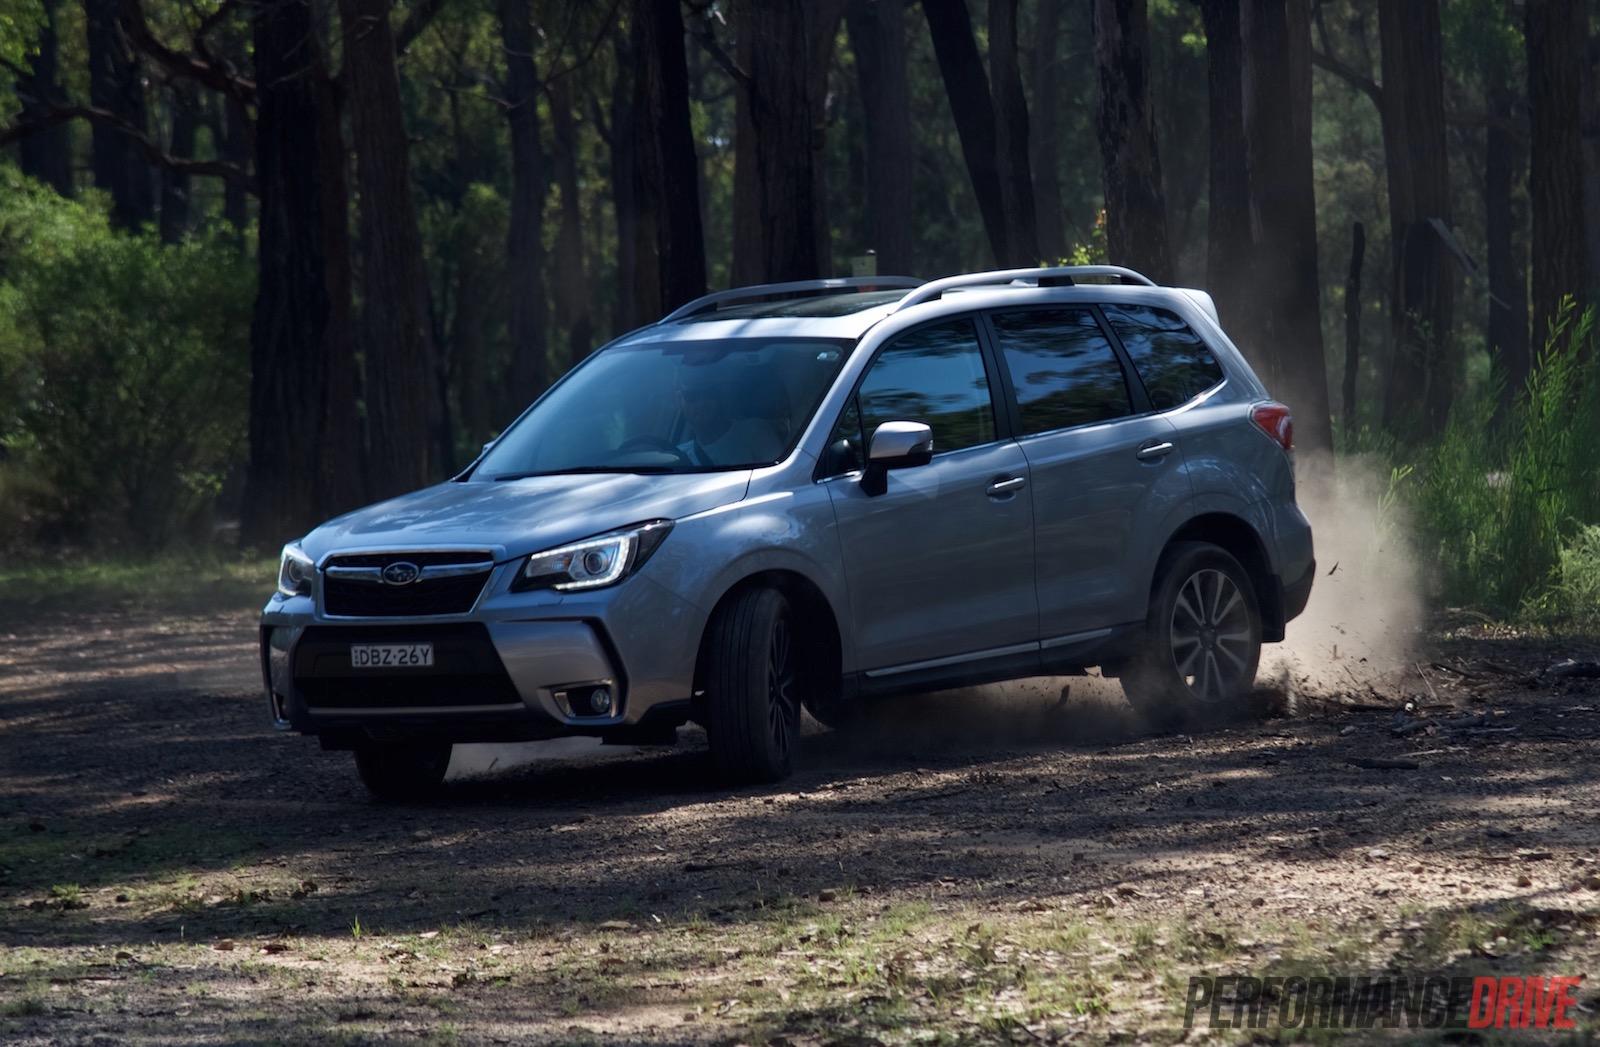 Subaru Forester Off Road >> 2016 Subaru Forester XT Premium review (video) | PerformanceDrive